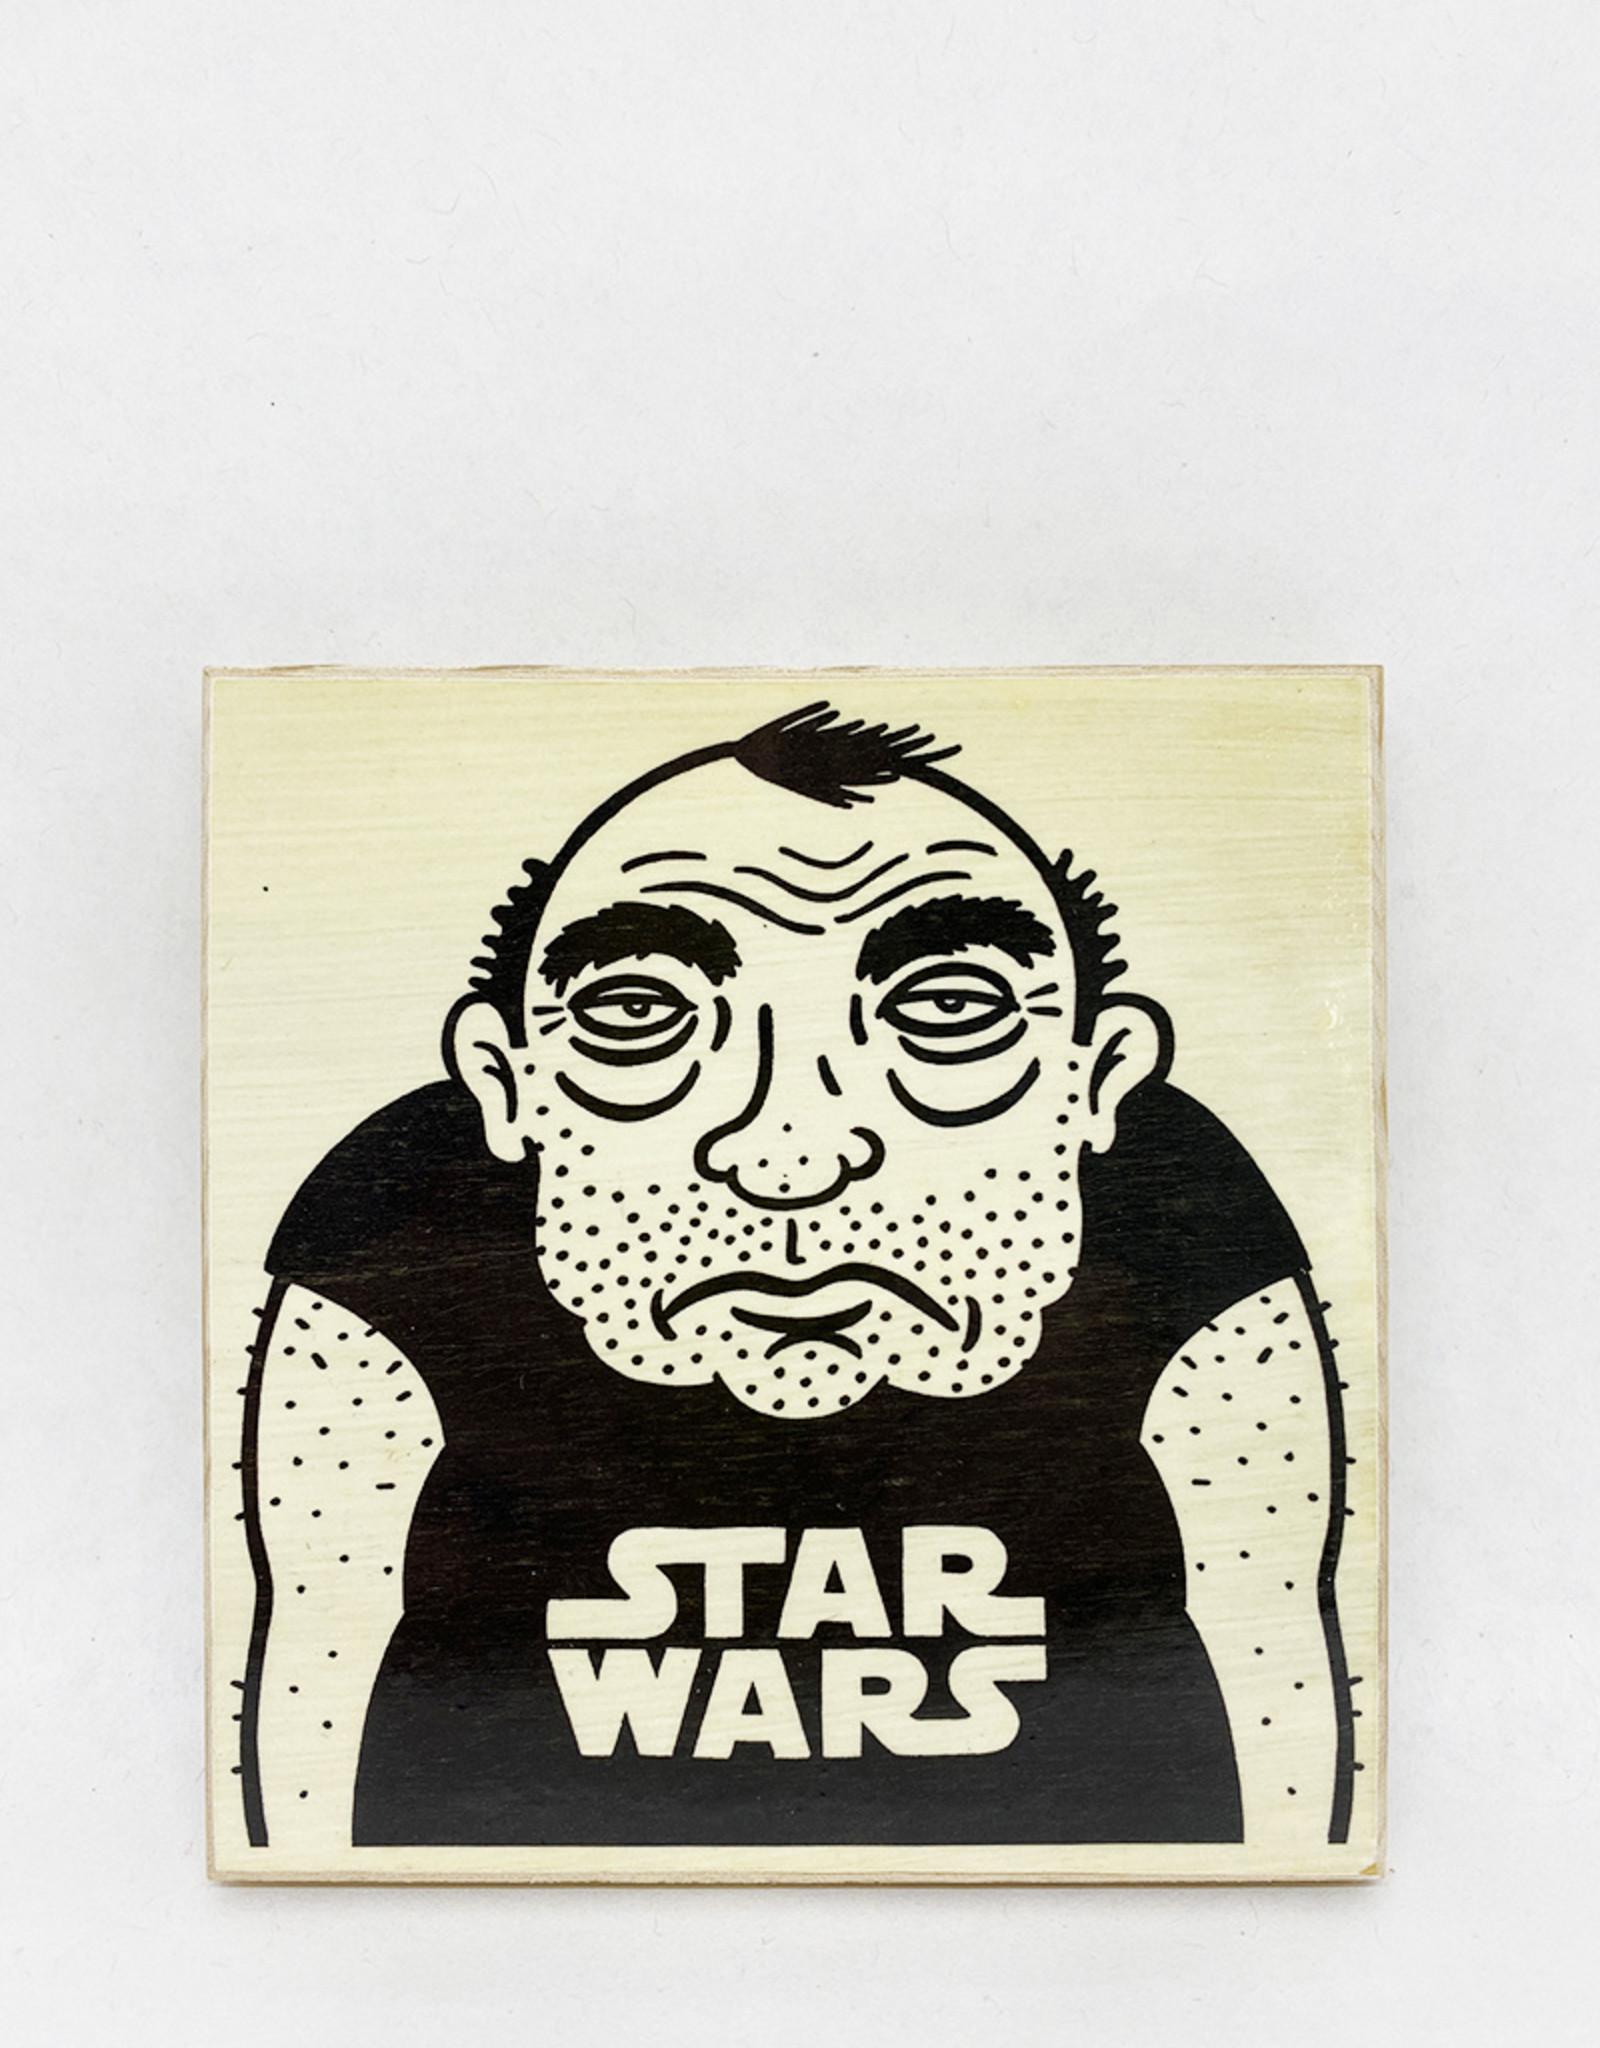 Dick Daniels Star Wars Image Transfer on Wood Block